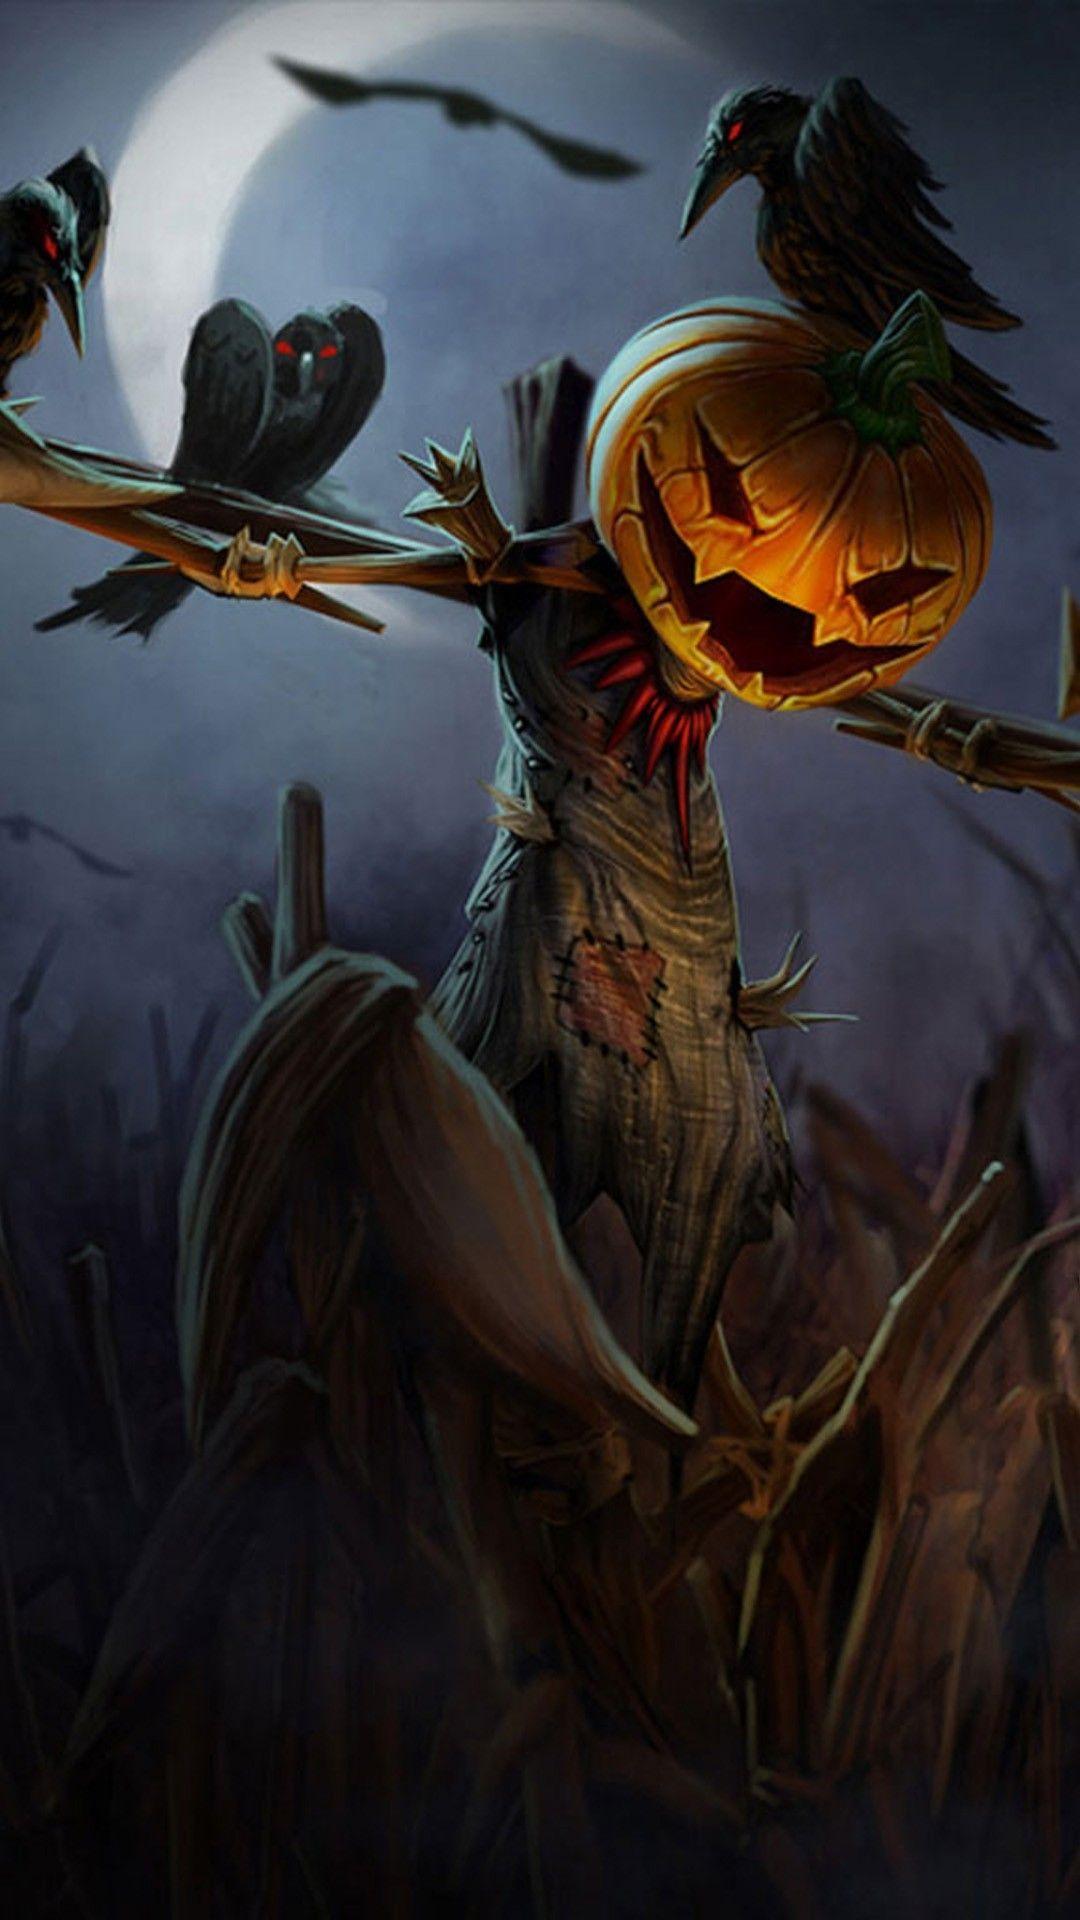 Scary Hd Wallpaper Android Fresh Wallpapers Ideas Halloween Wallpaper Backgrounds Scary Wallpaper Halloween Desktop Wallpaper